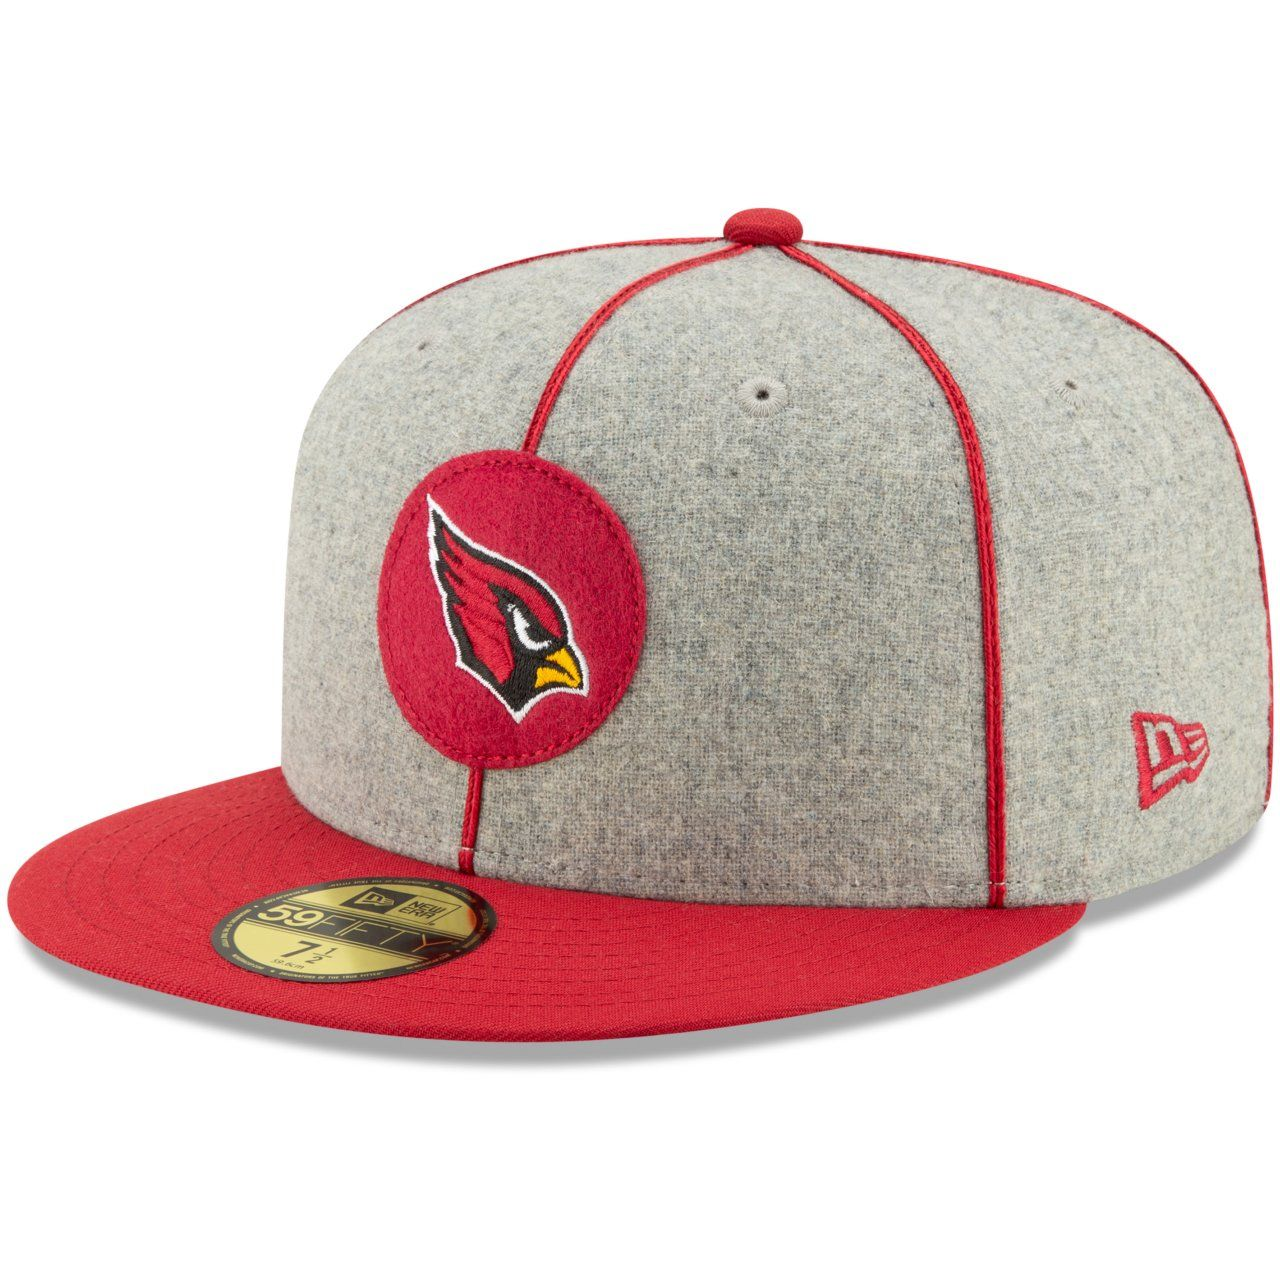 amfoo - New Era 59Fifty Cap - Sideline 30s Arizona Cardinals